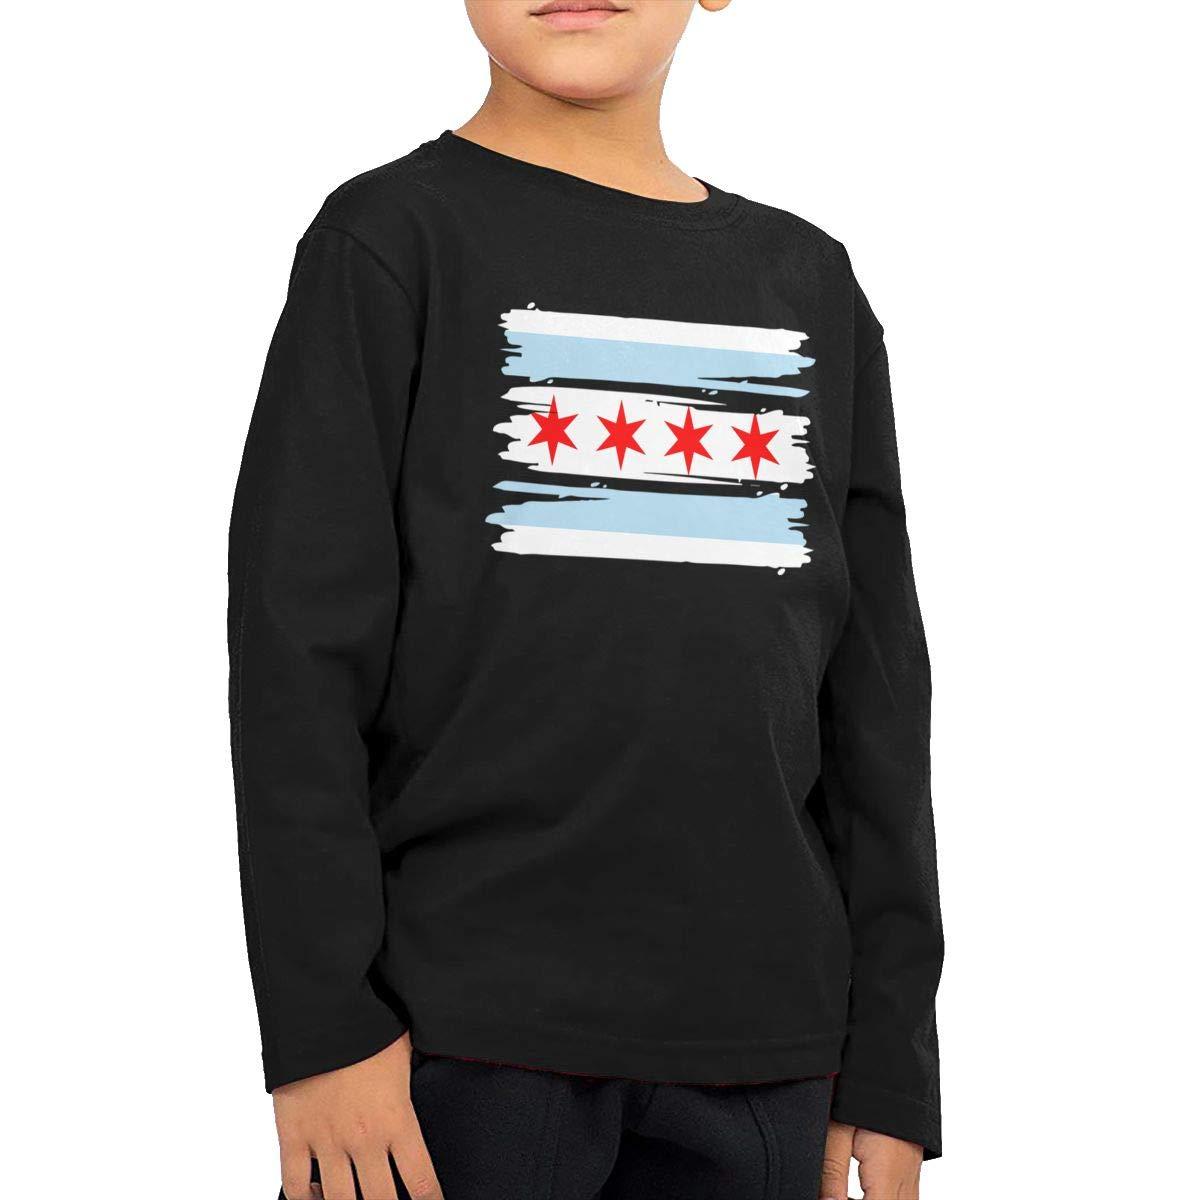 CERTONGCXTS Childrens Chicago Flag ComfortSoft Long Sleeve Shirt